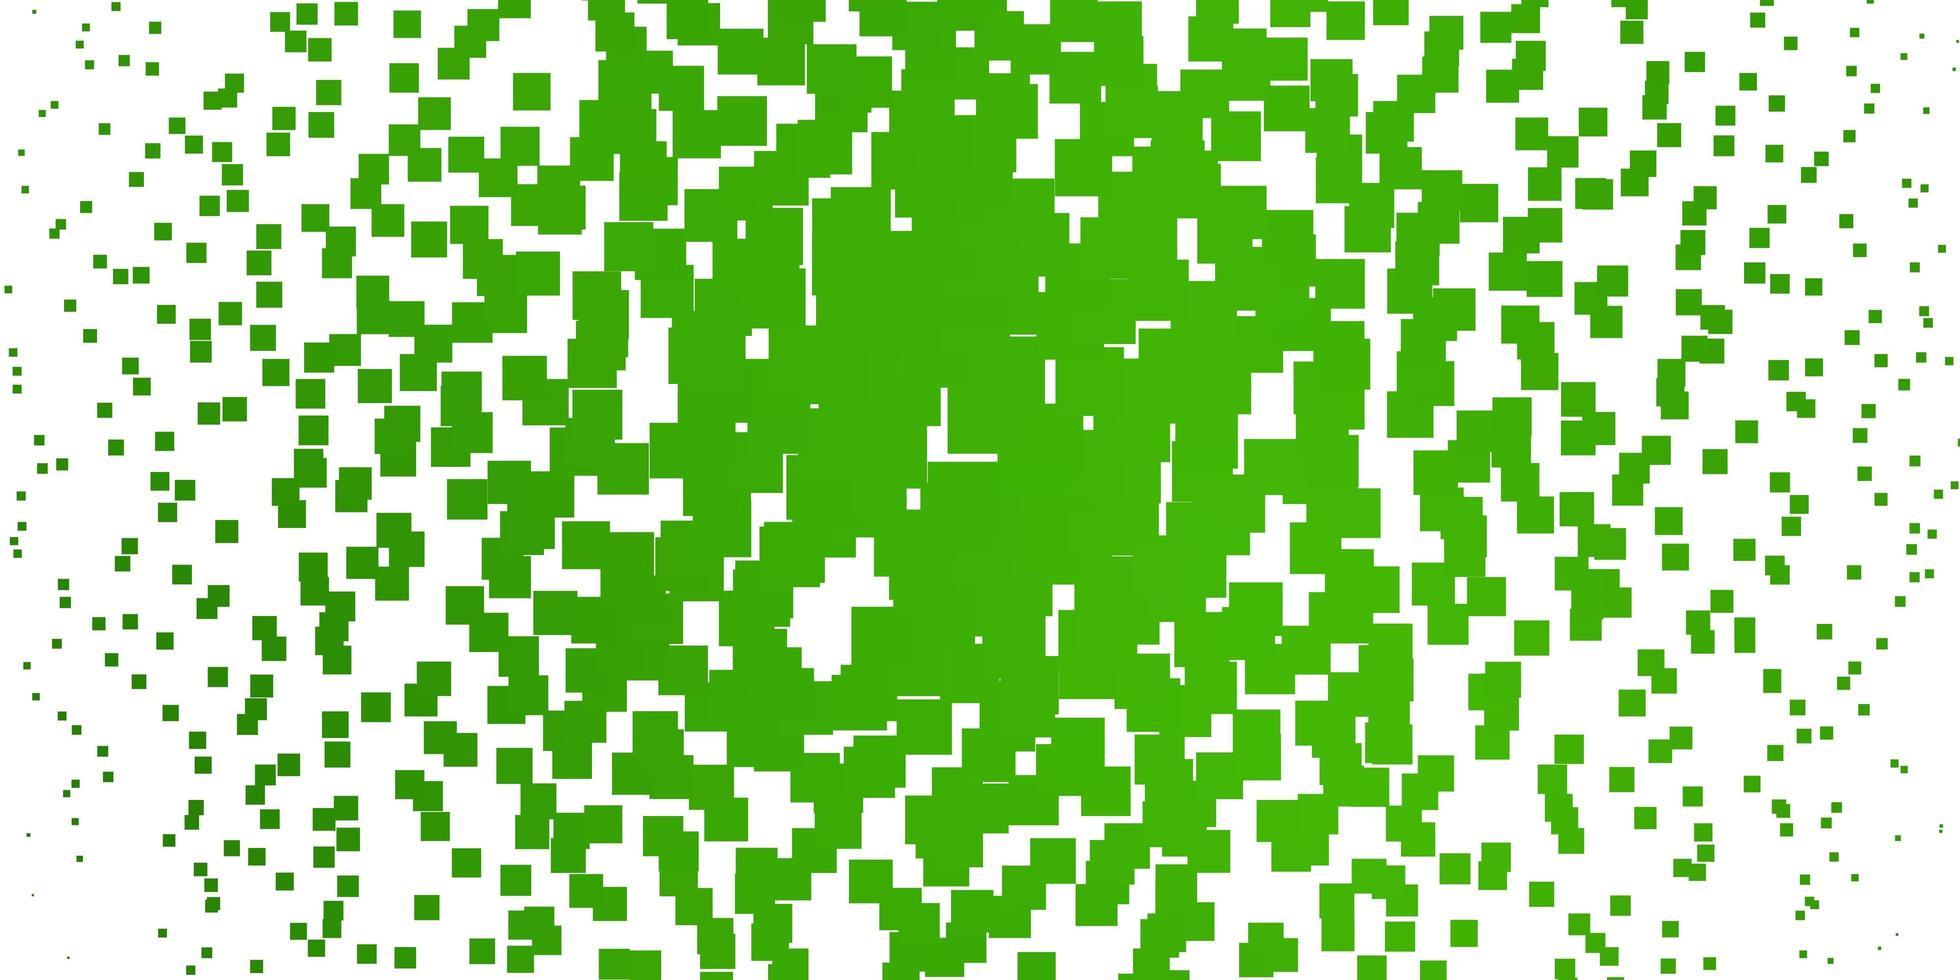 fundo vector verde claro em estilo poligonal.